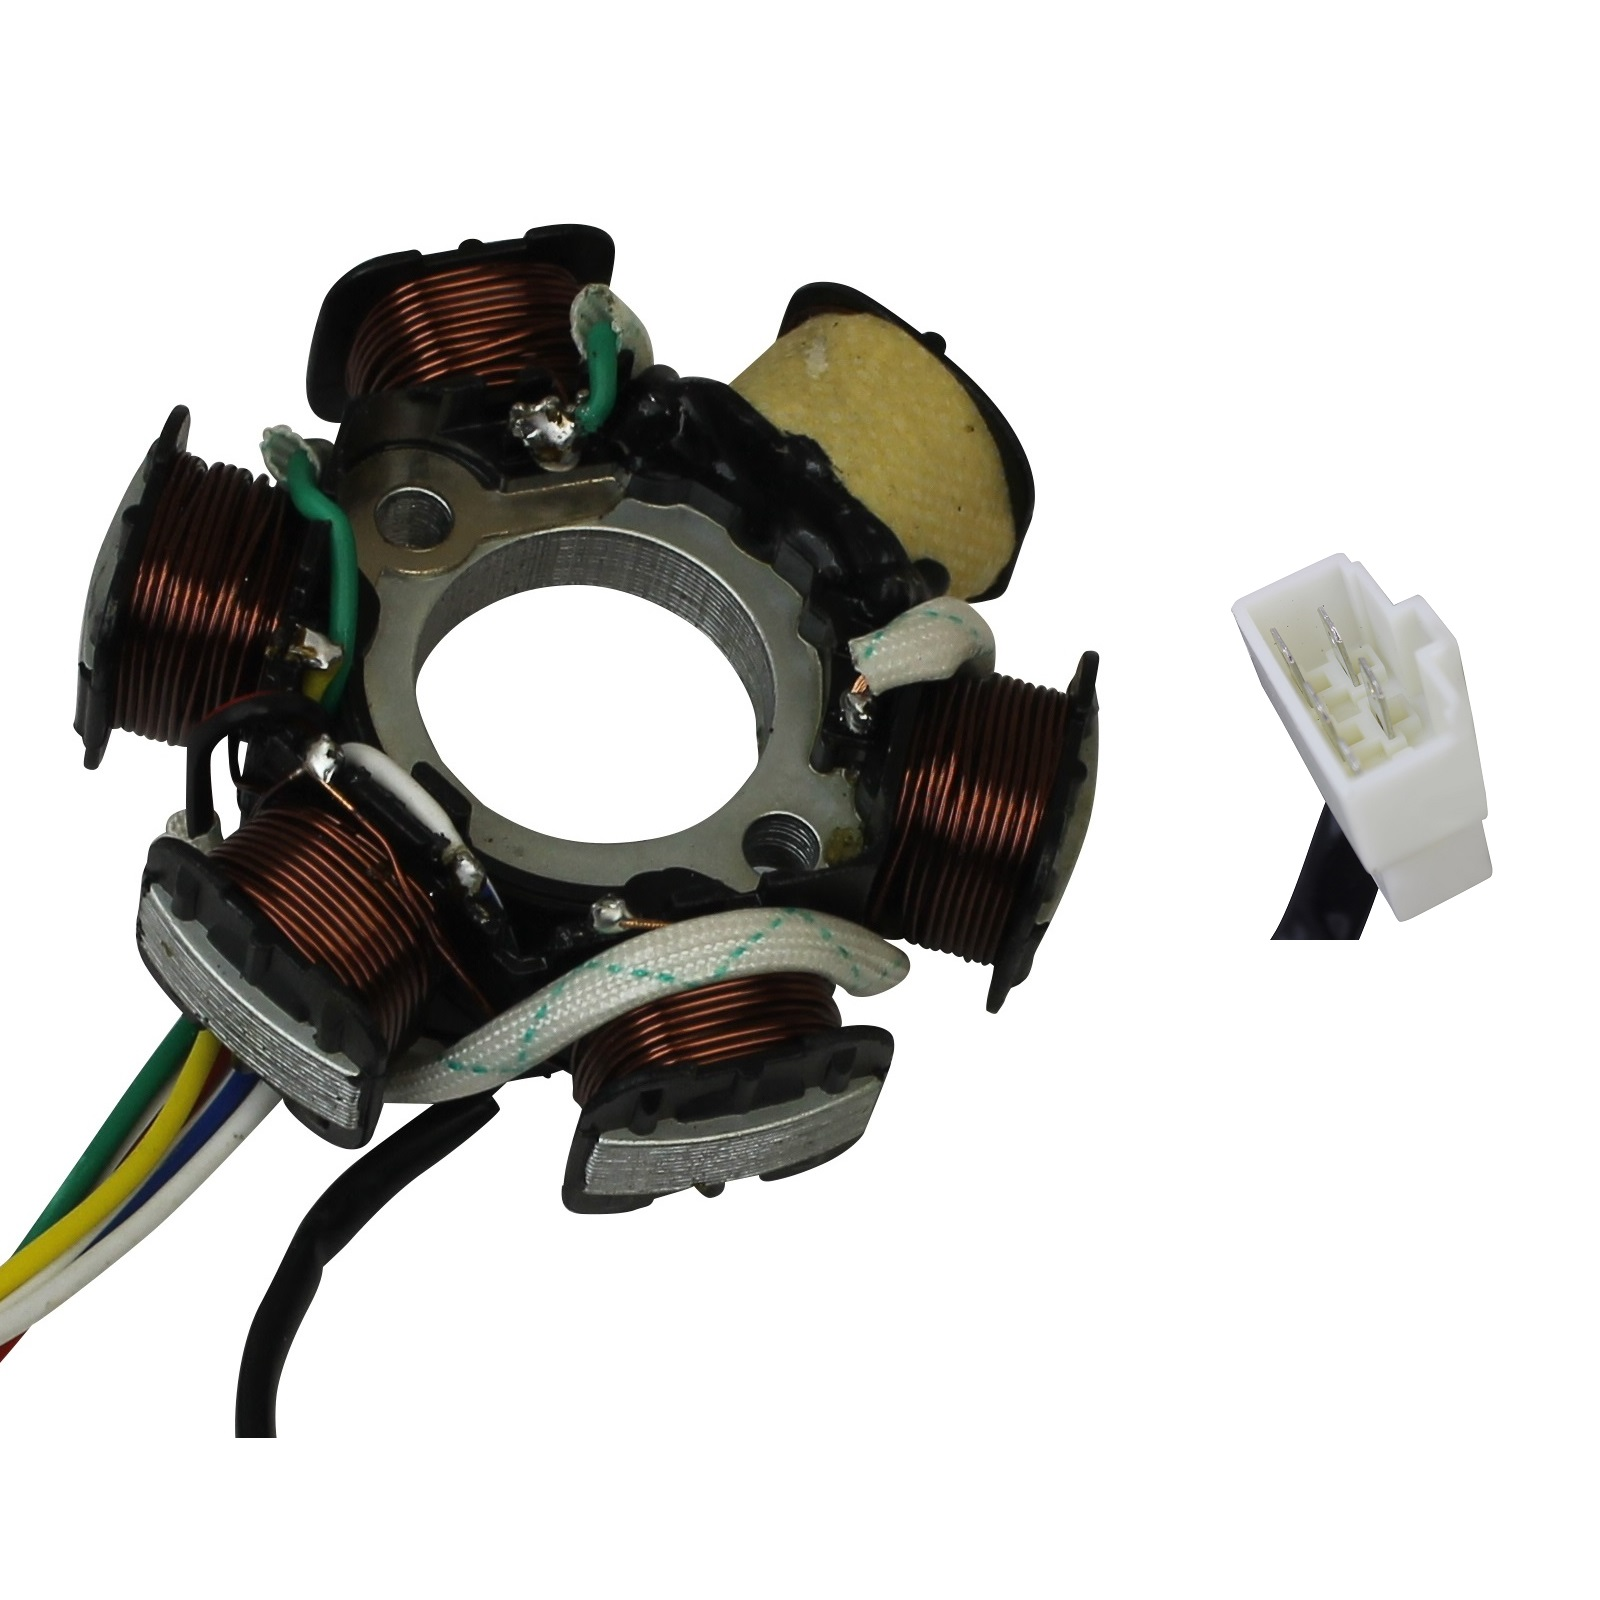 hight resolution of stator 6 coil 5 wire 50cc 70cc 90cc 110cc 125cc honda chinese atv motorcycle